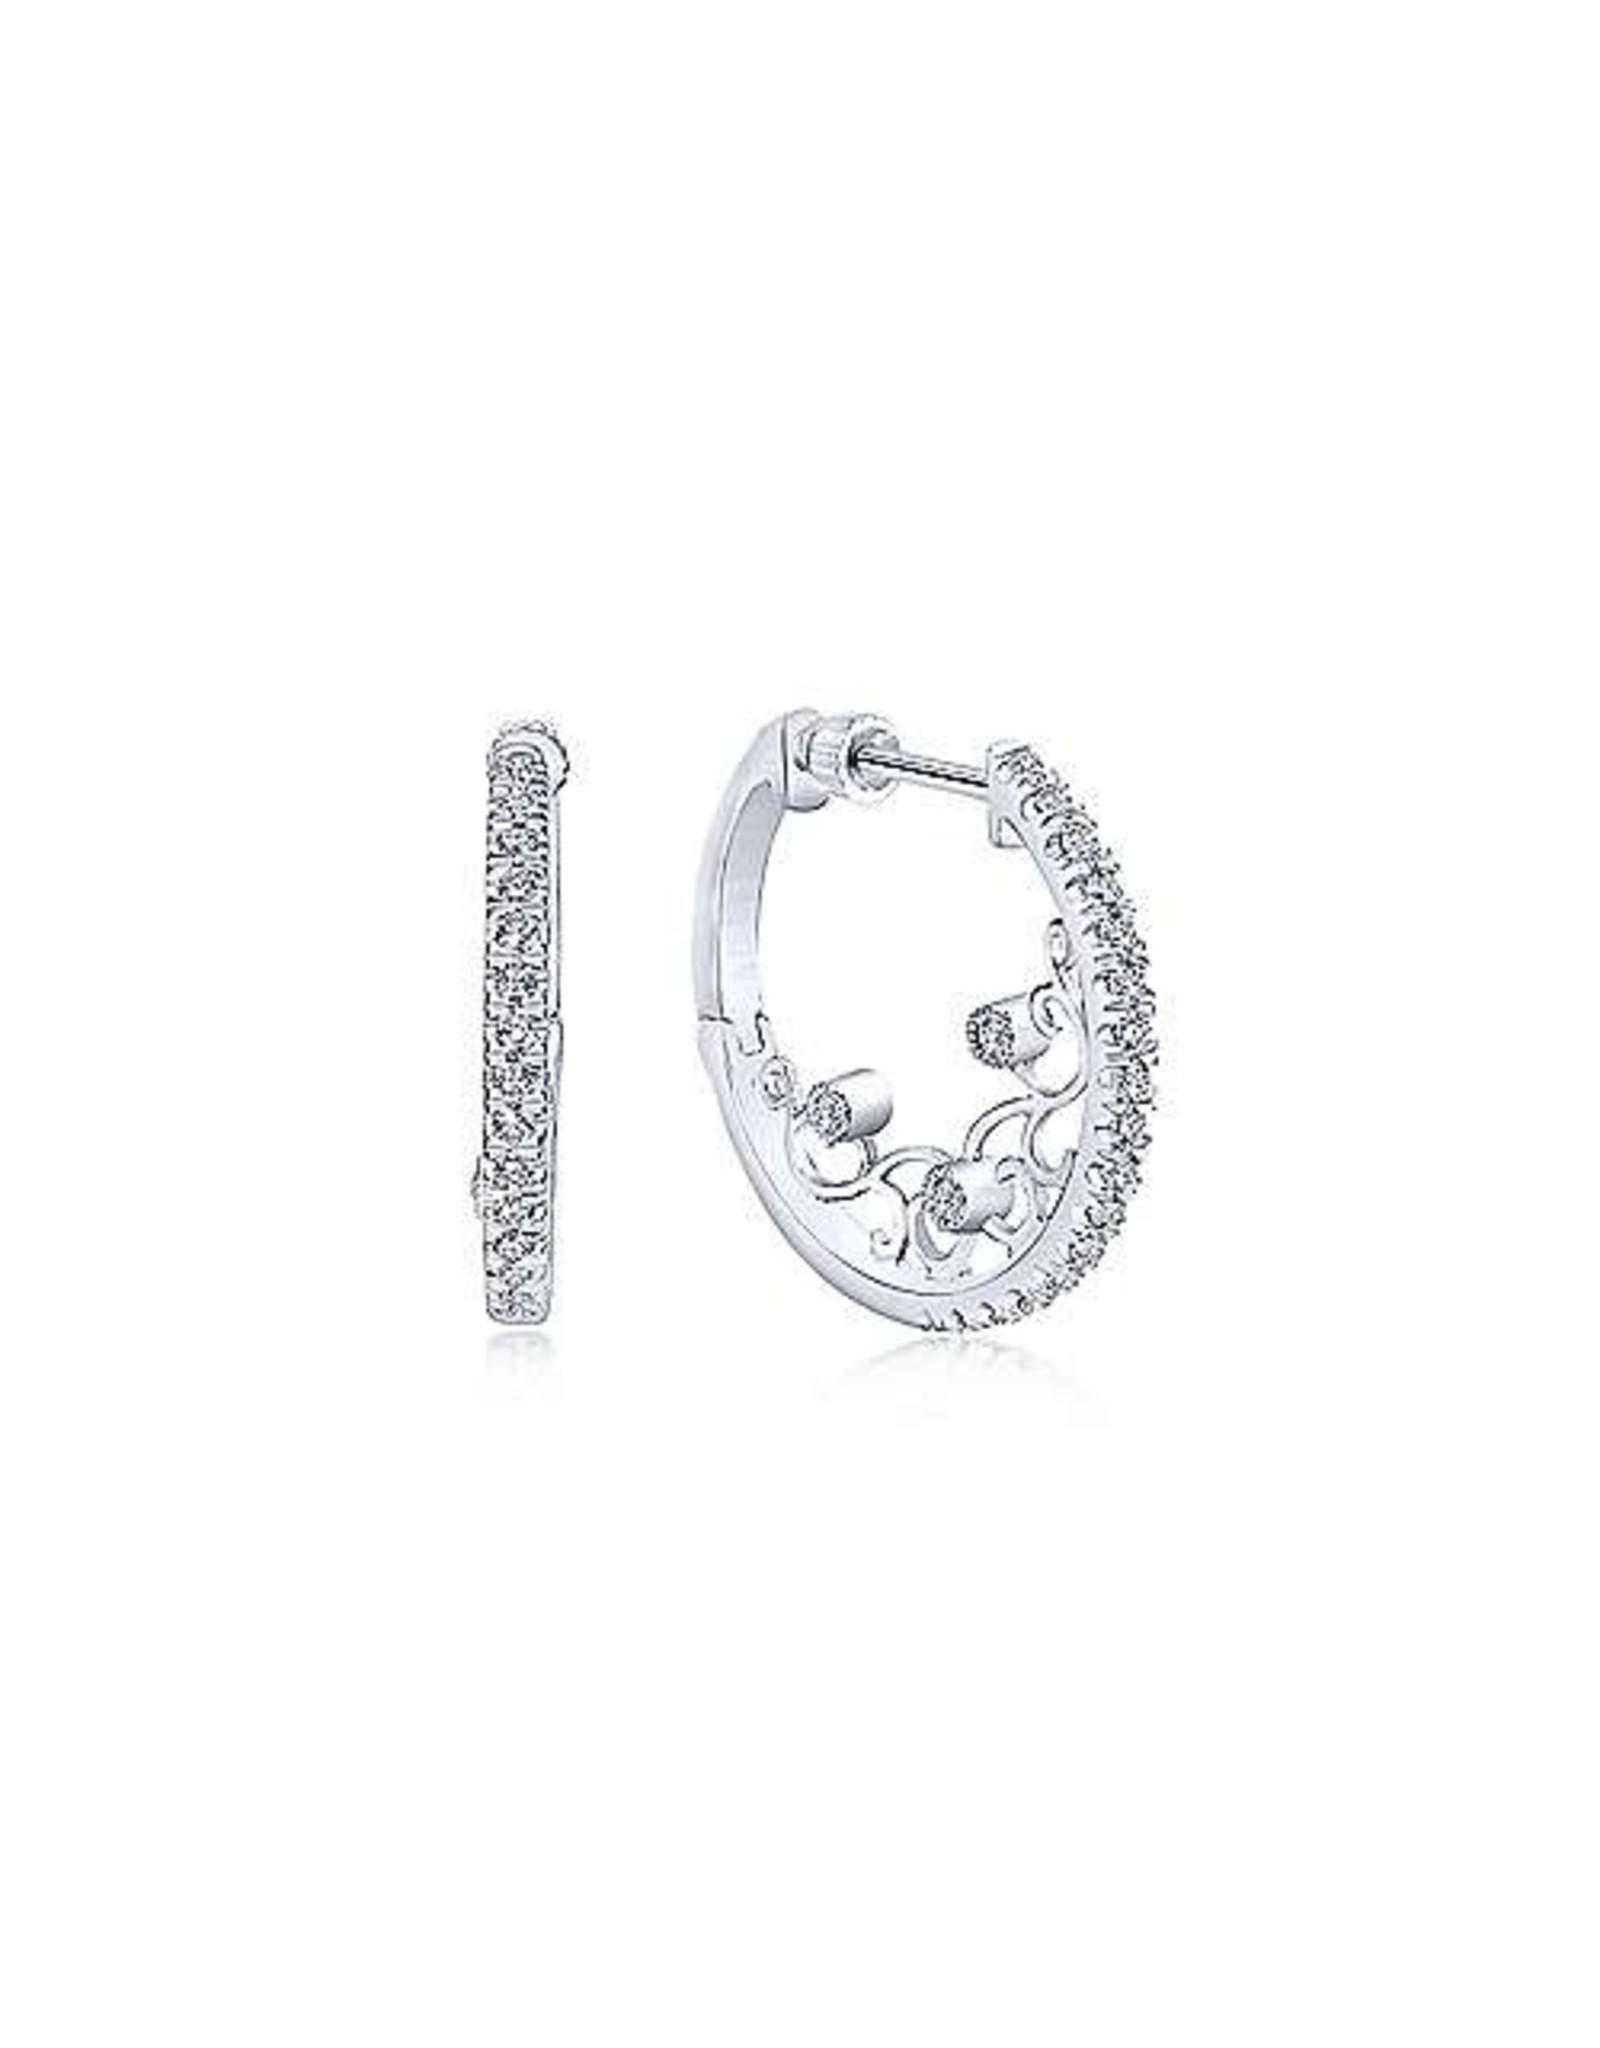 14K White Gold 20mm Intricate Diamond Hoop Earrings, D: 0.52ct